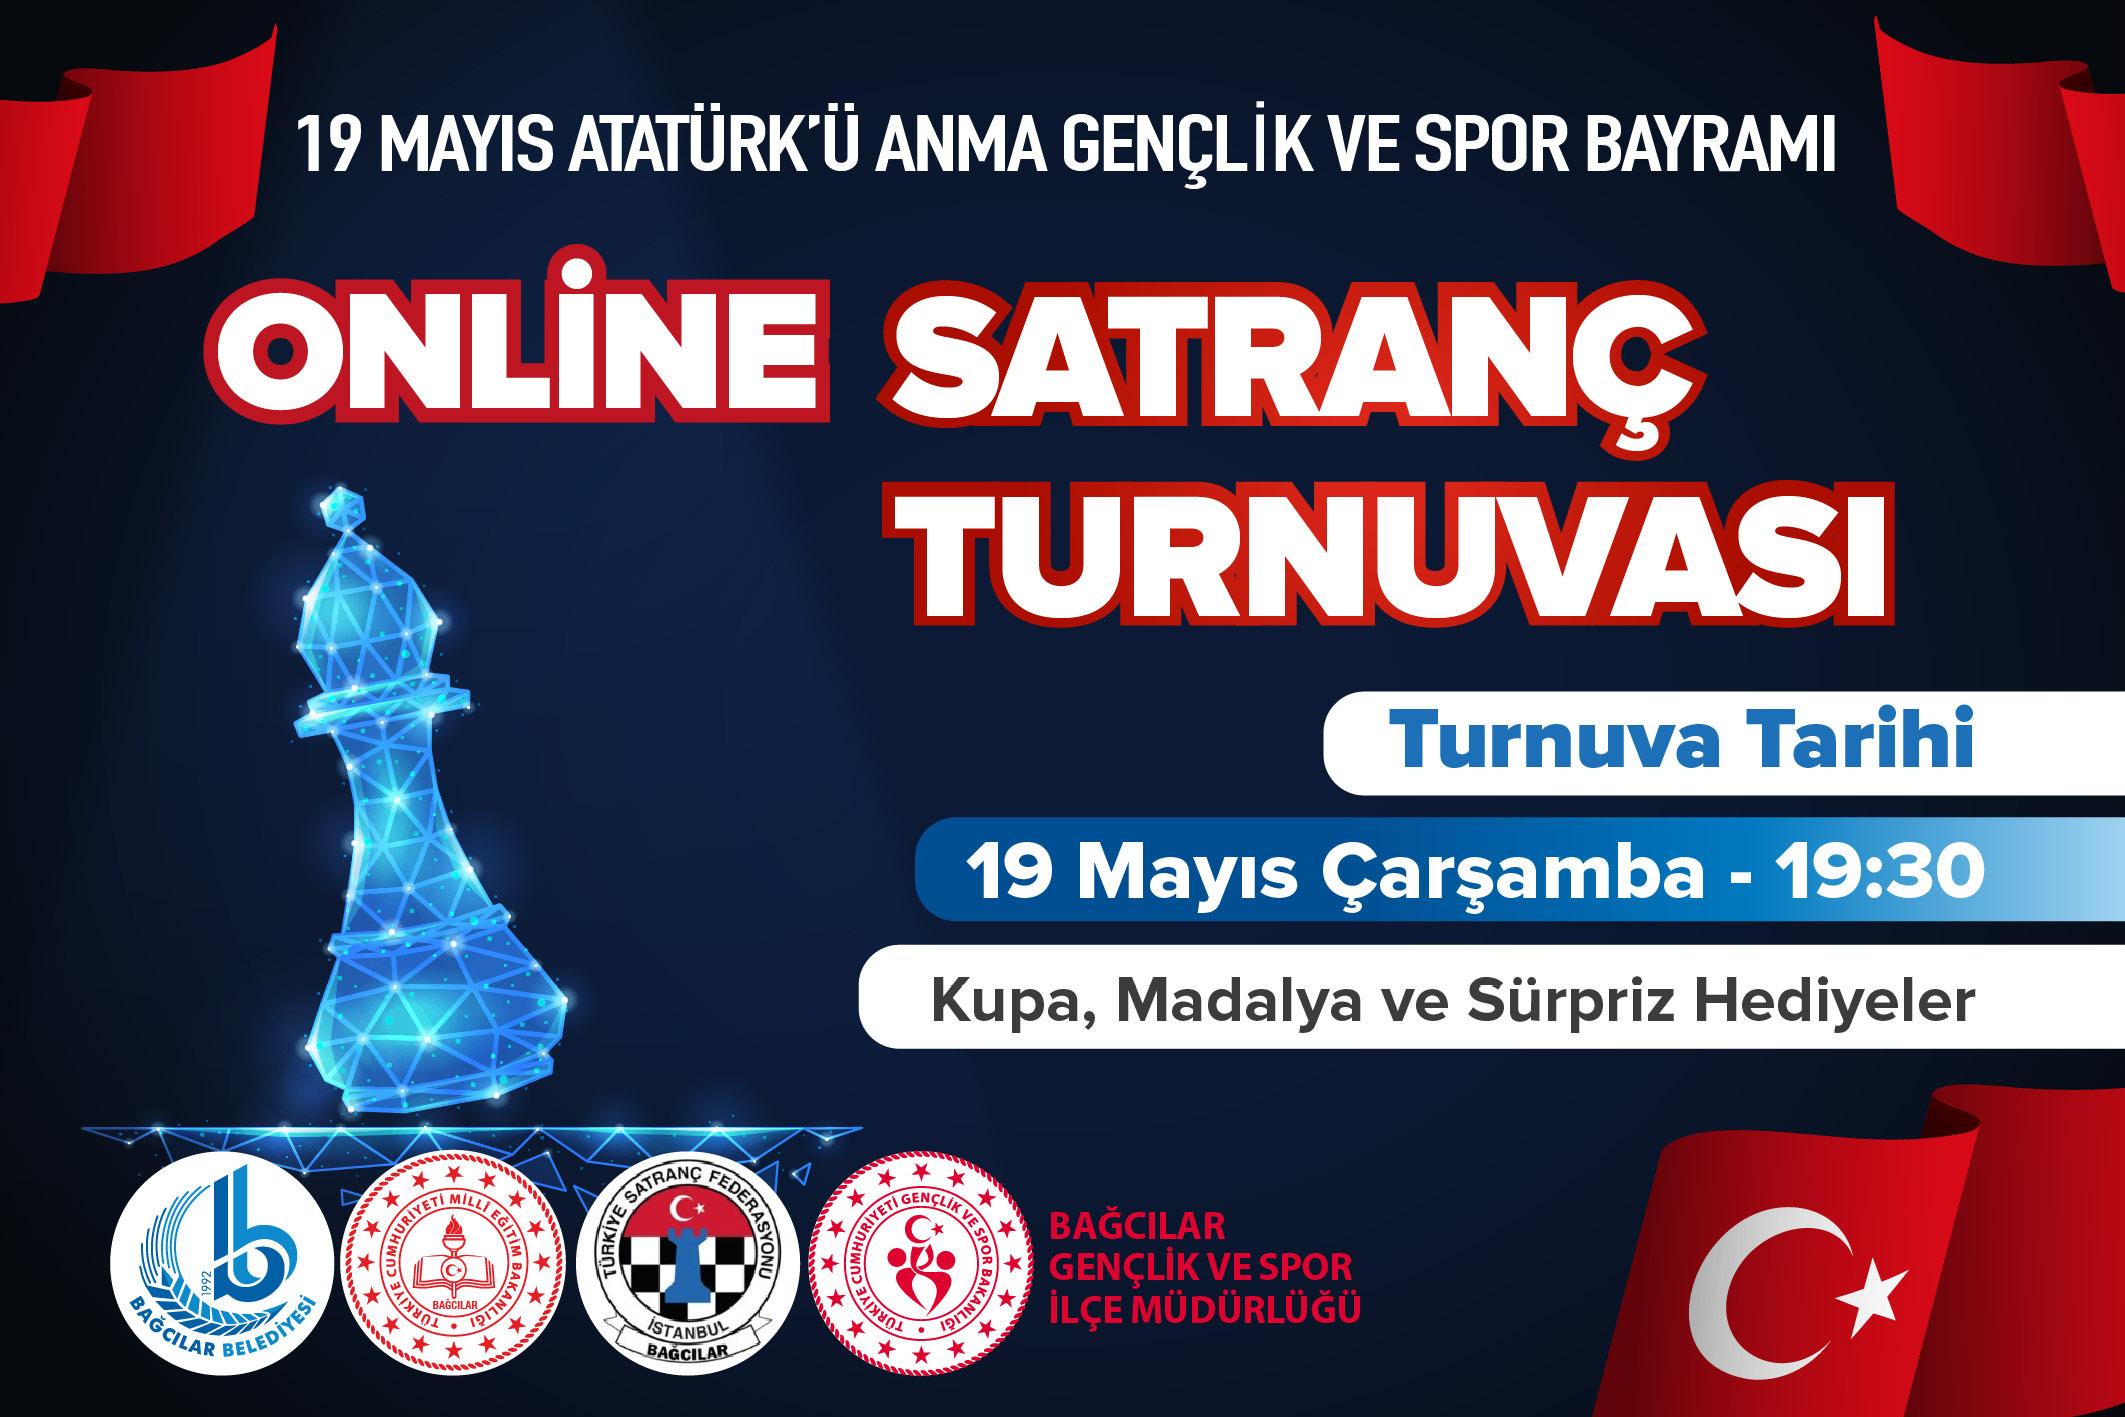 Online Satranç Turnuvası 19 Mayıs 2021